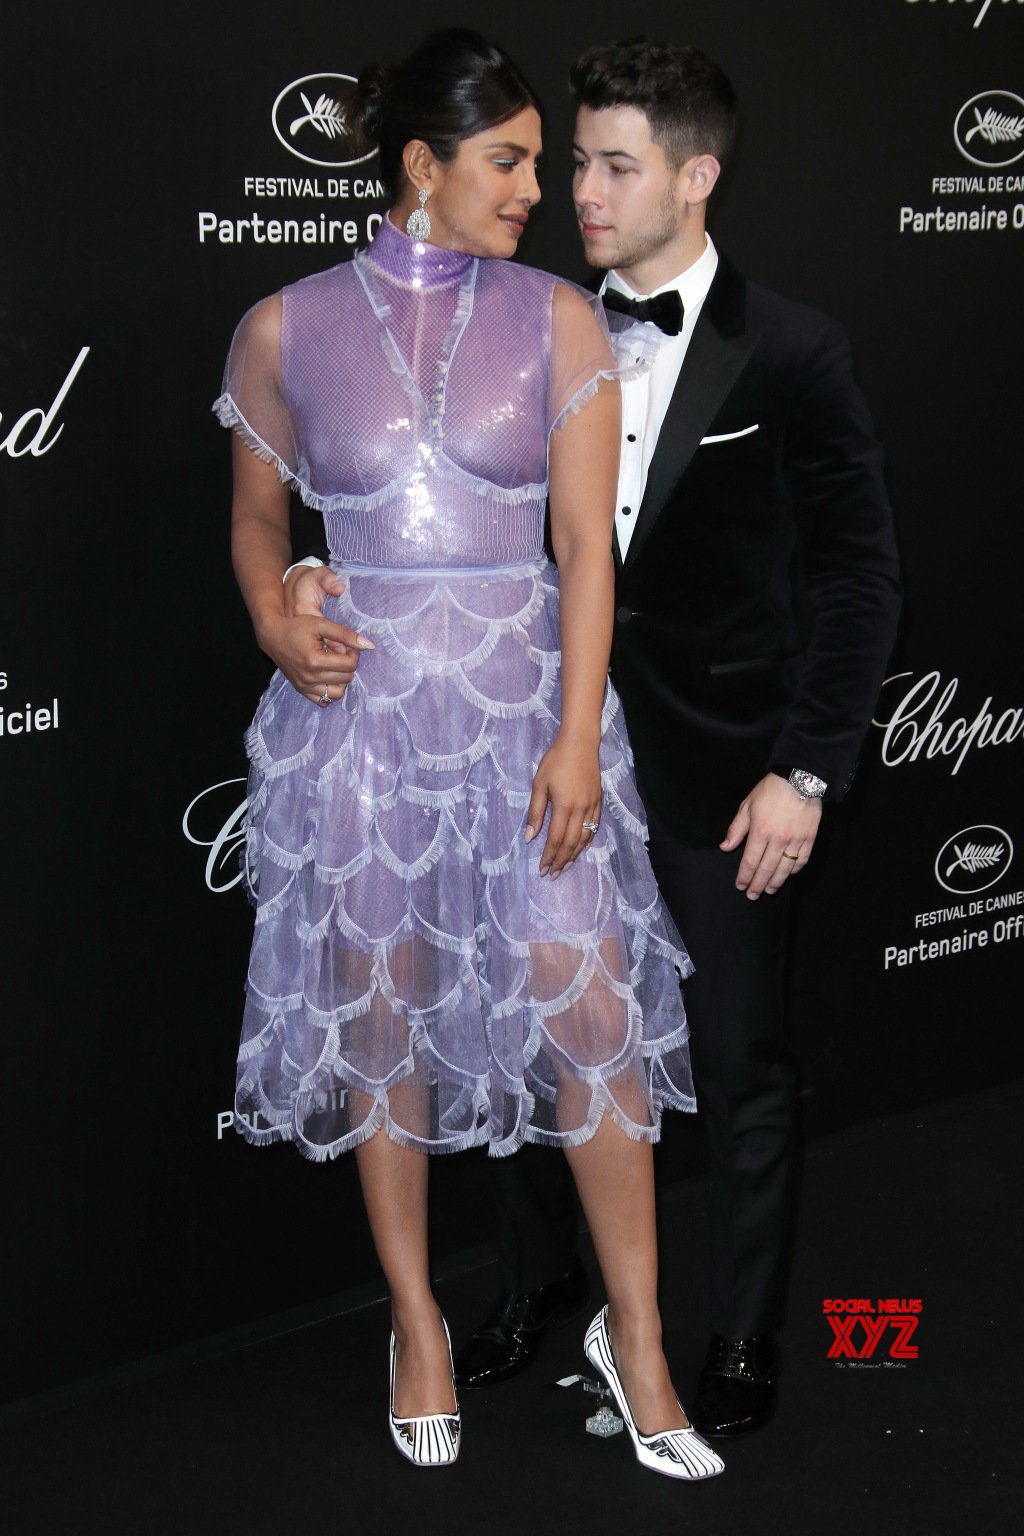 Nick Jonas And Priyanka Chopra Latest Still From Cannes 2019 Red Carpet